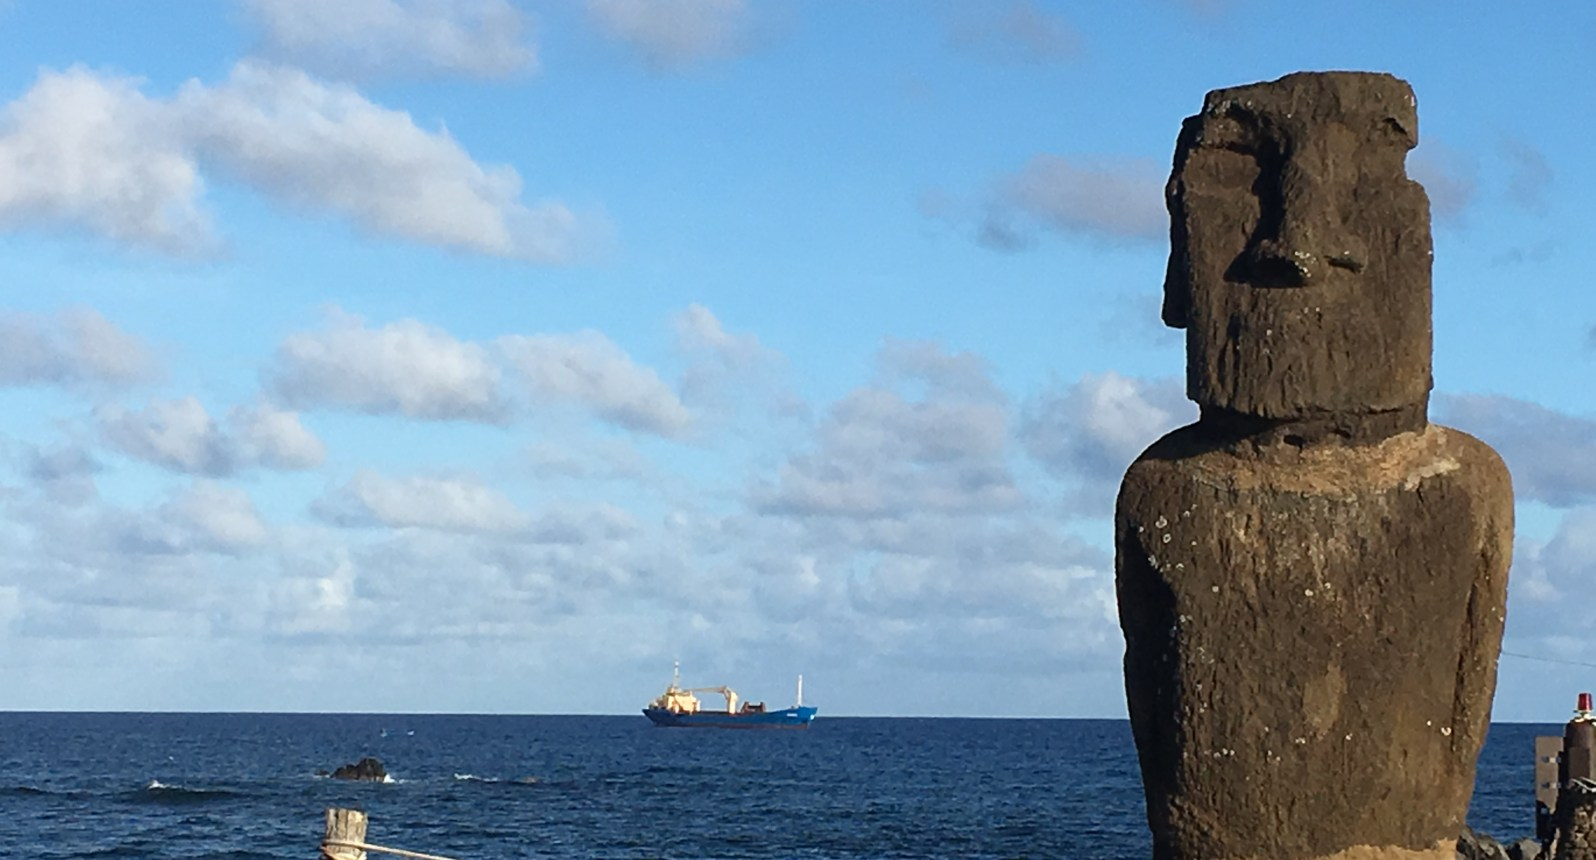 Seed Launching Pad >> Hanga Roa Launching Pad For Visiting The Moai Samai Haider